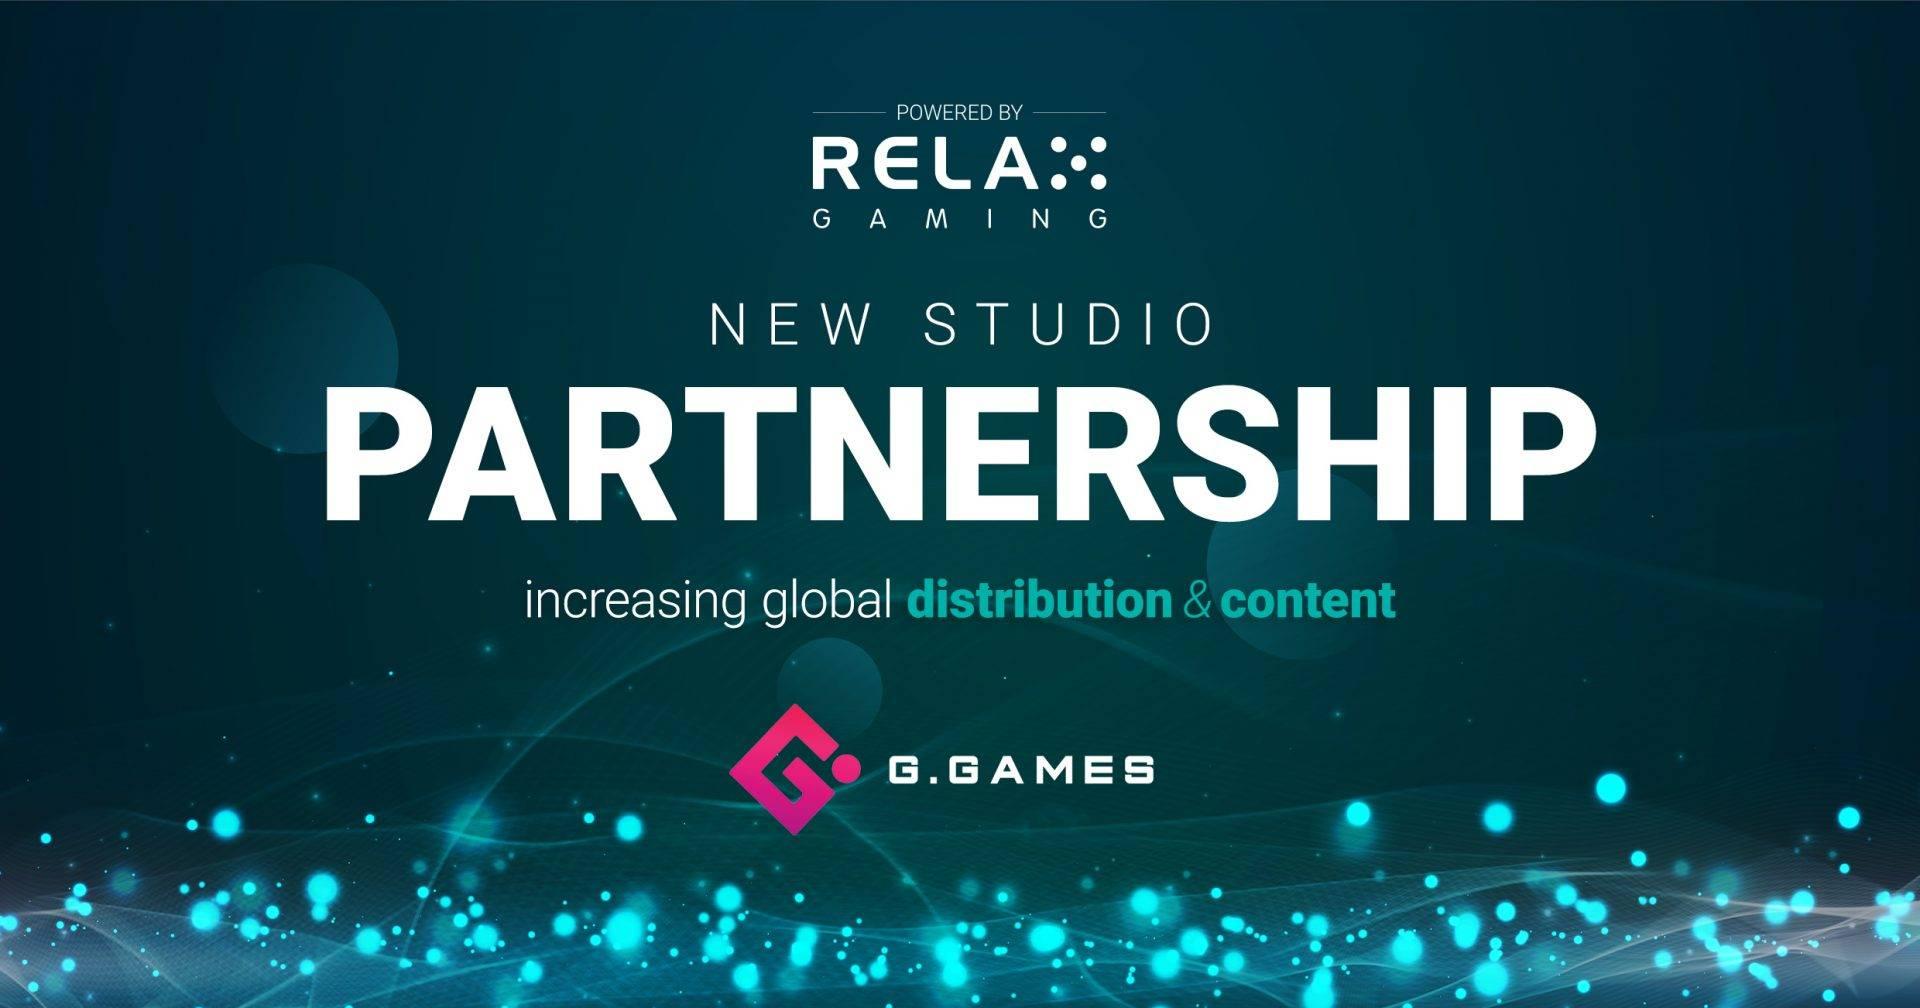 relax gaming partnership